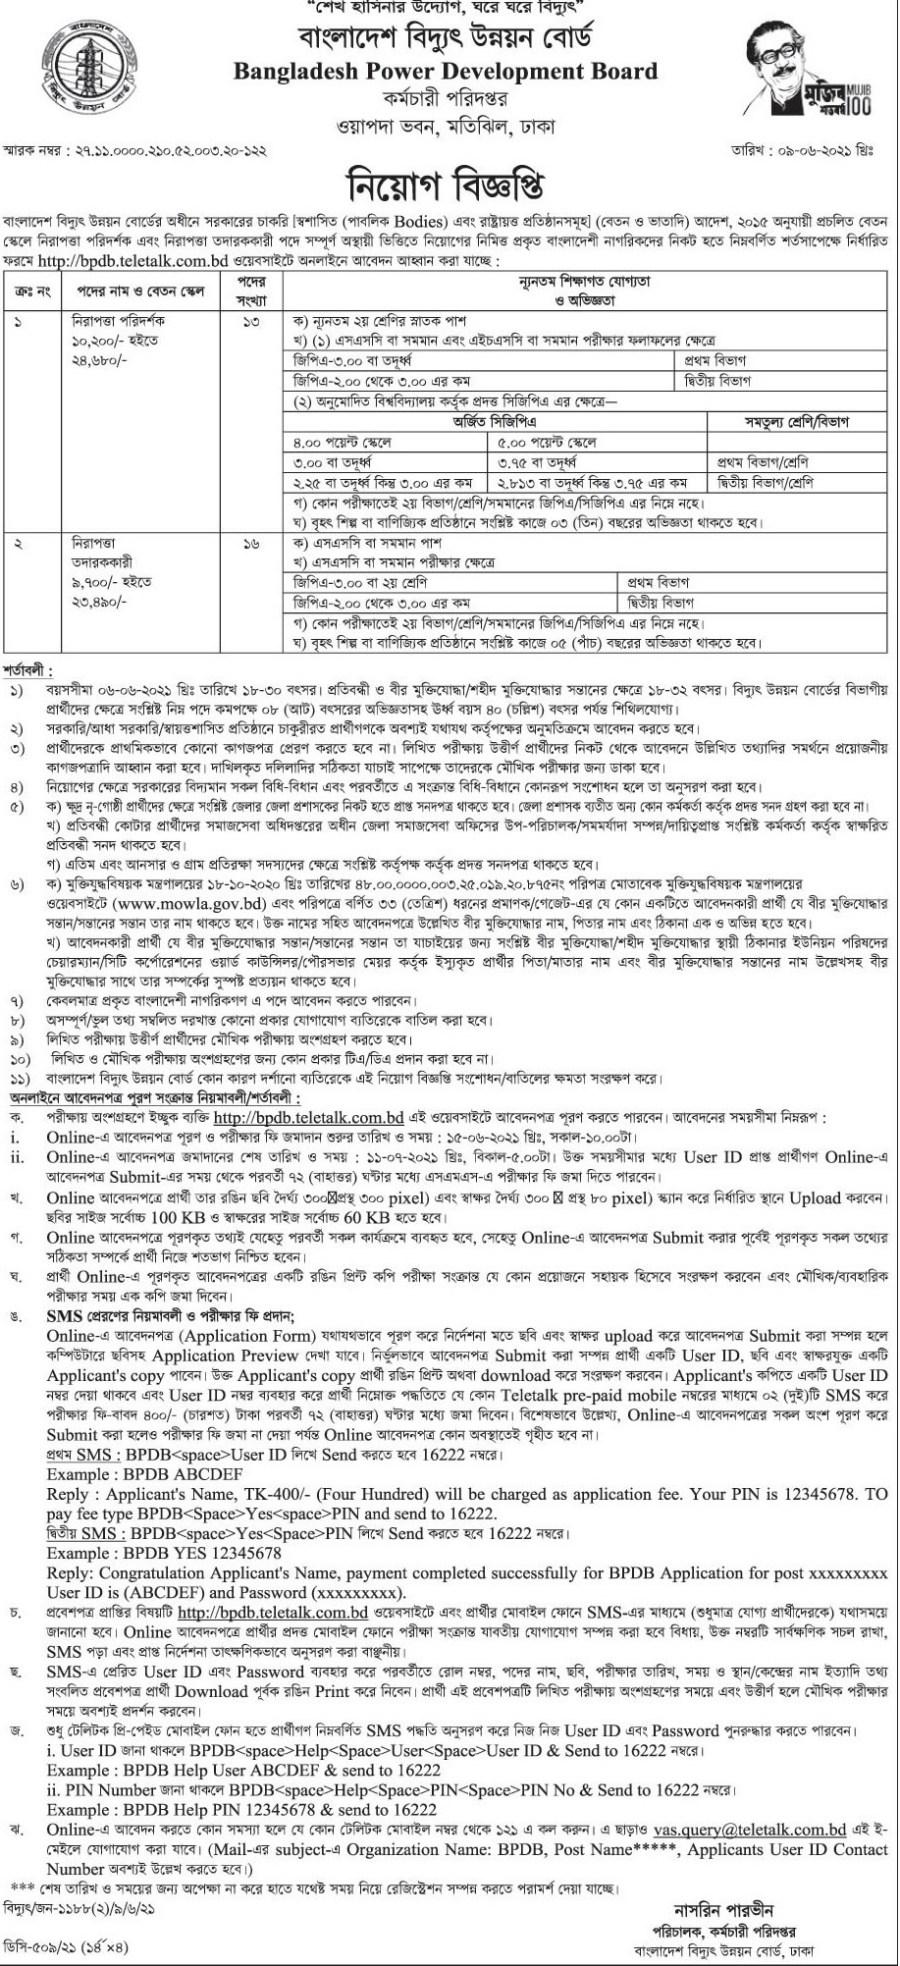 Bangladesh Power Development (BPDB) Board Job Circular July 2021